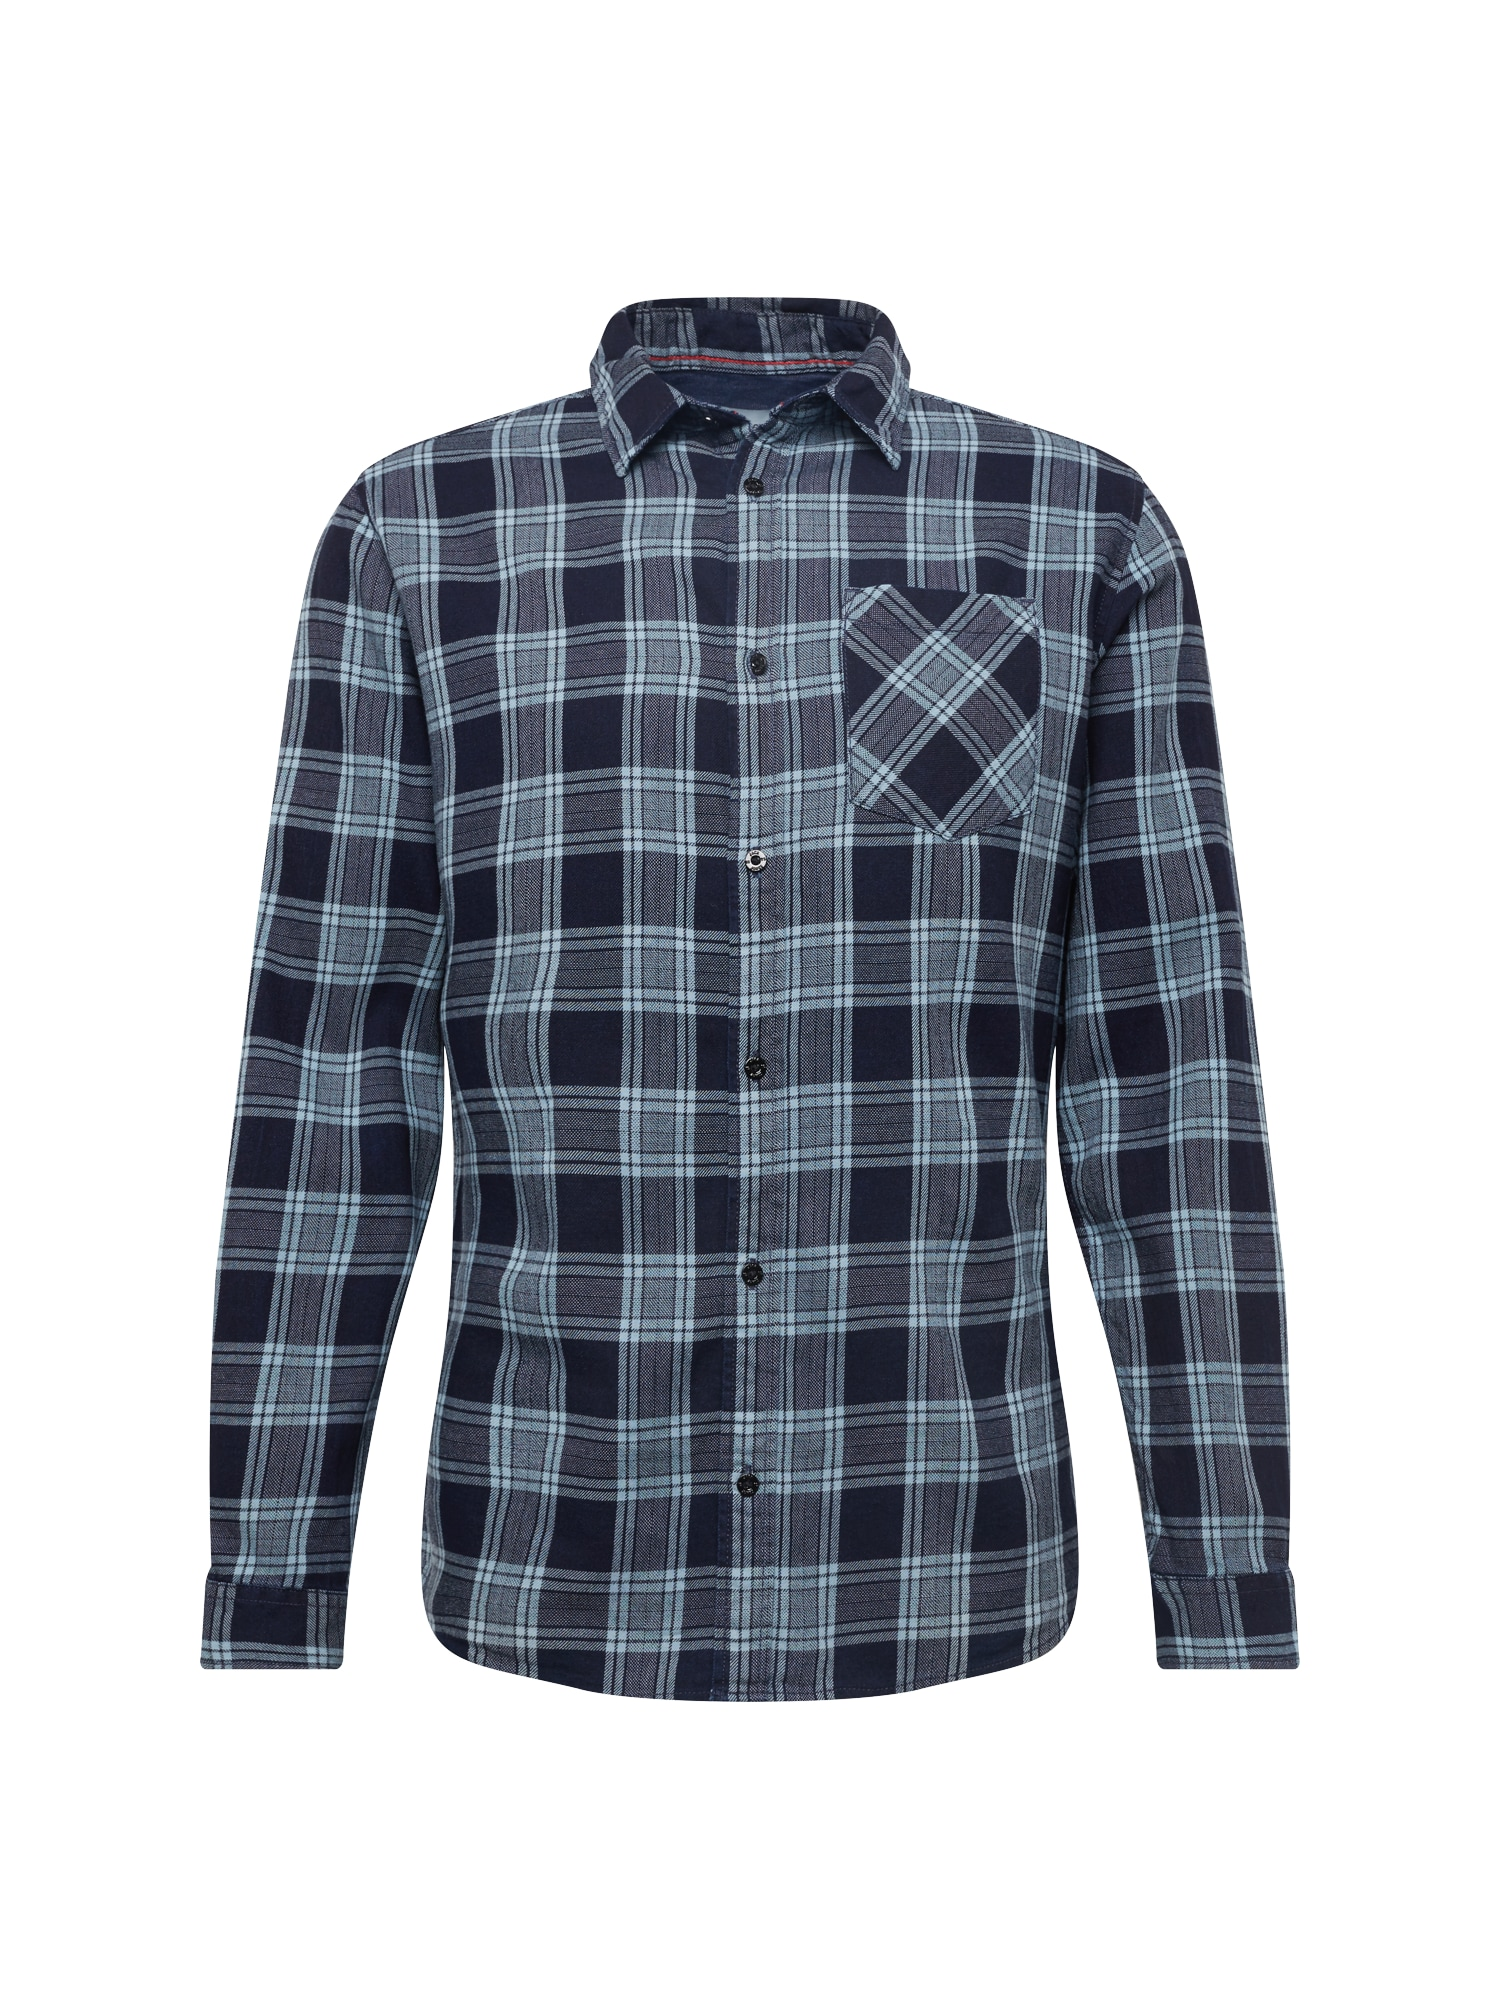 Košile JCOLLOYD SHIRT LS CHECK tmavě modrá JACK & JONES